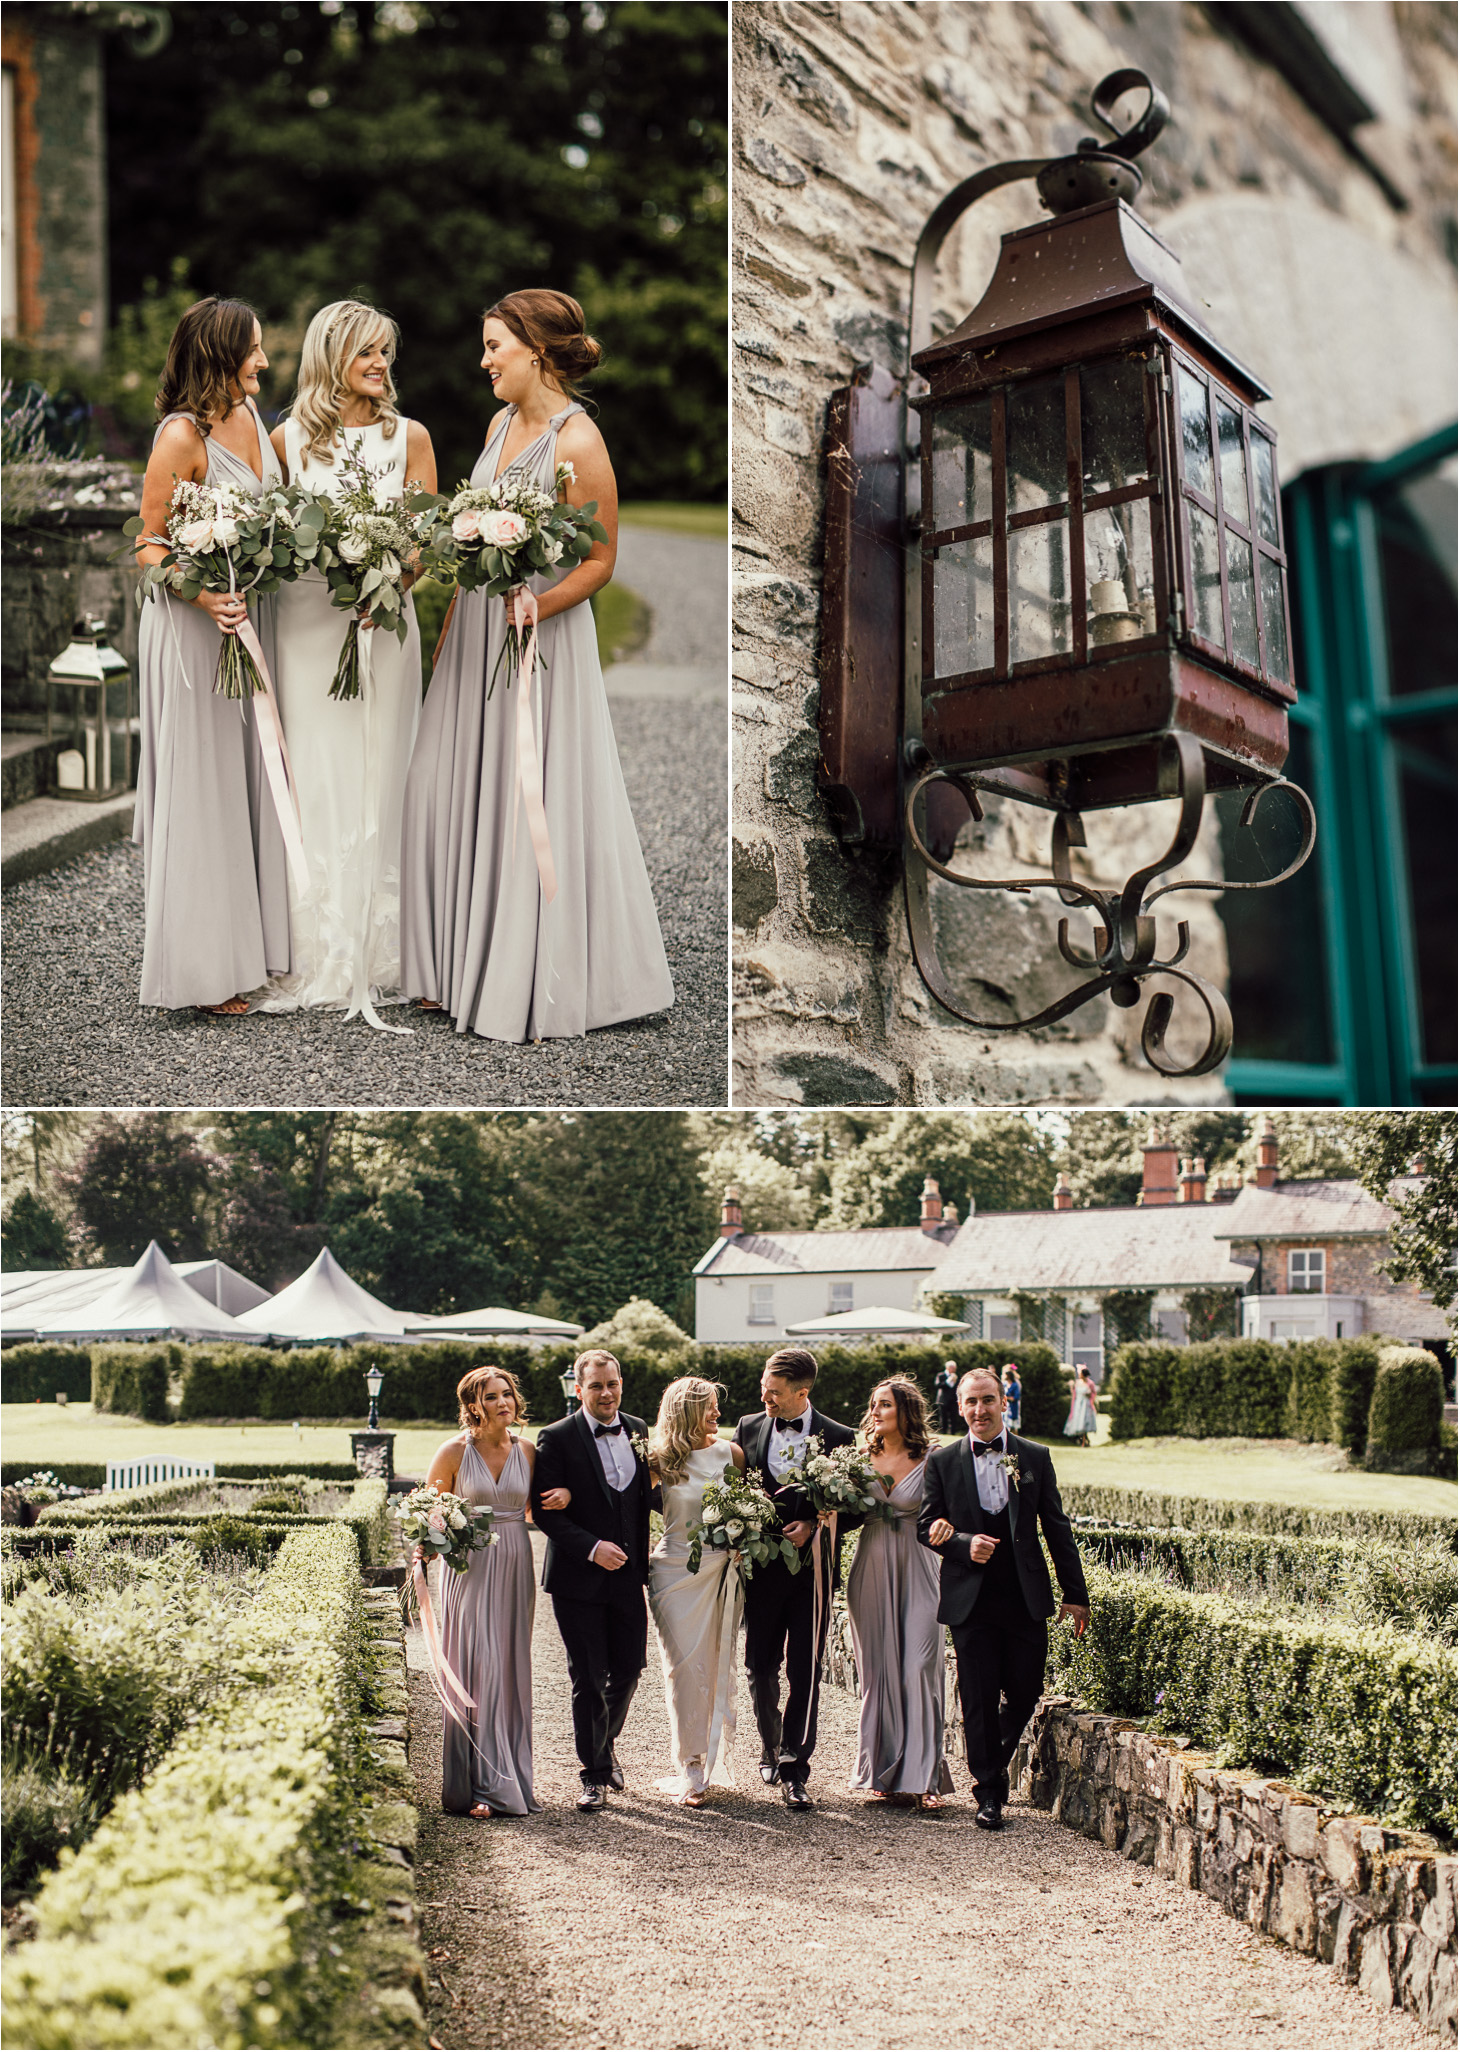 Virgina Lodge Photography. darren fitzpatrick. Wedding.14